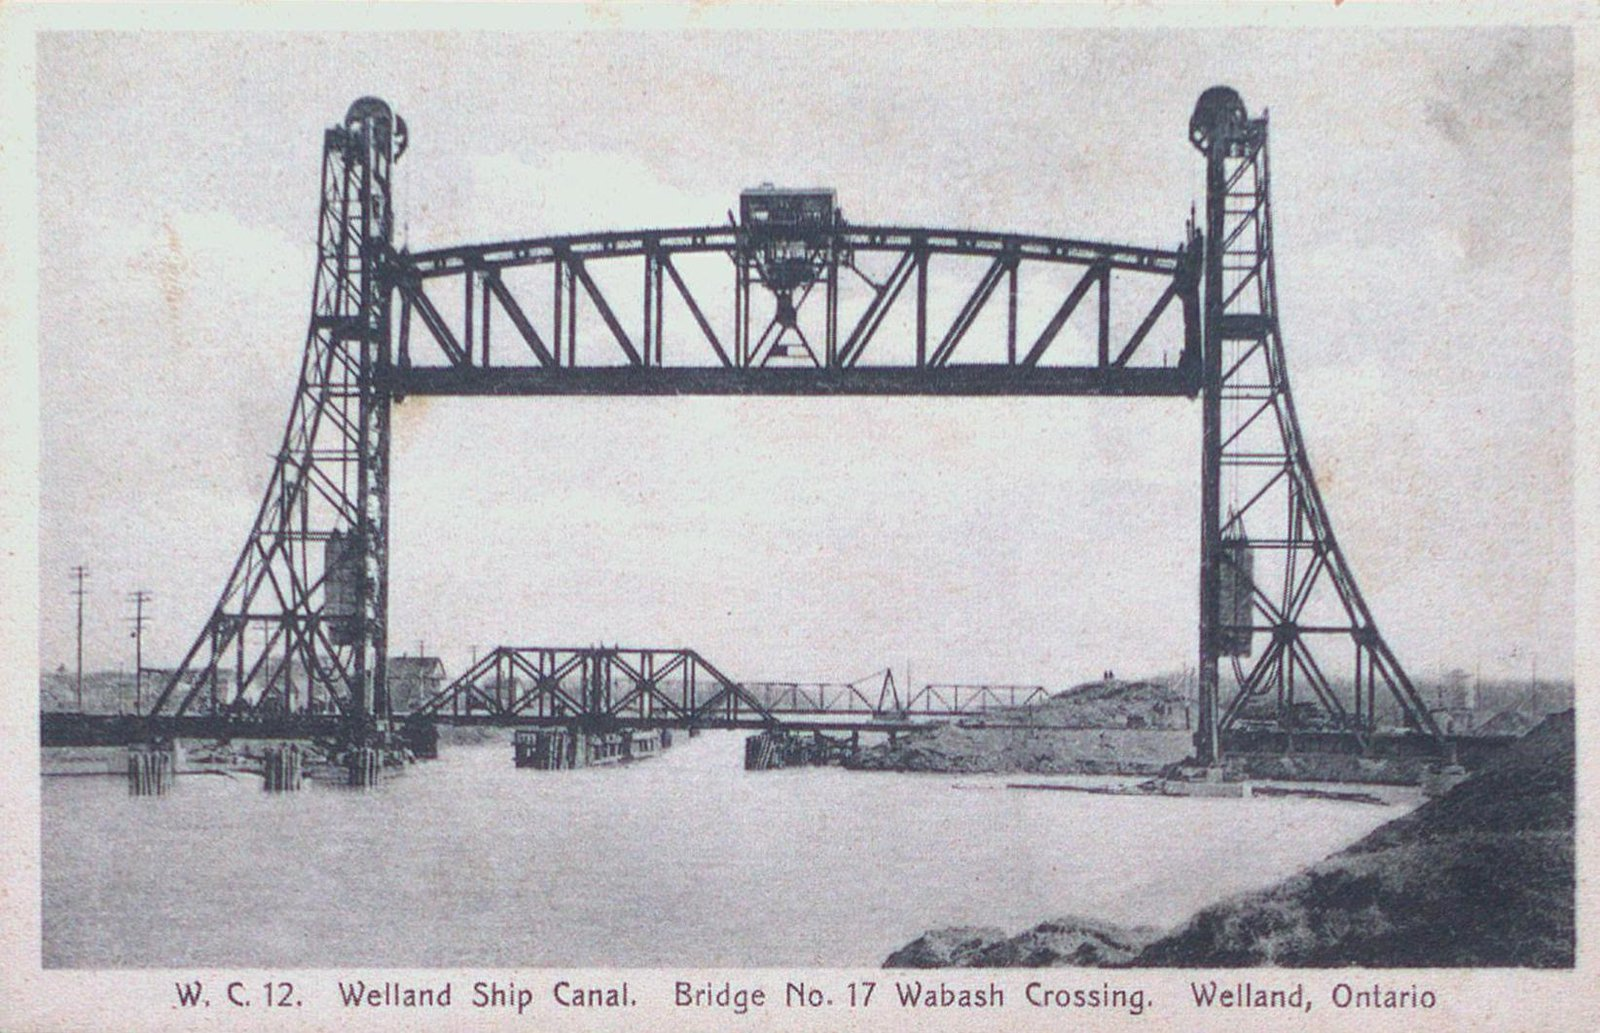 Wabash Lift Bridge on the Welland Ship Canal